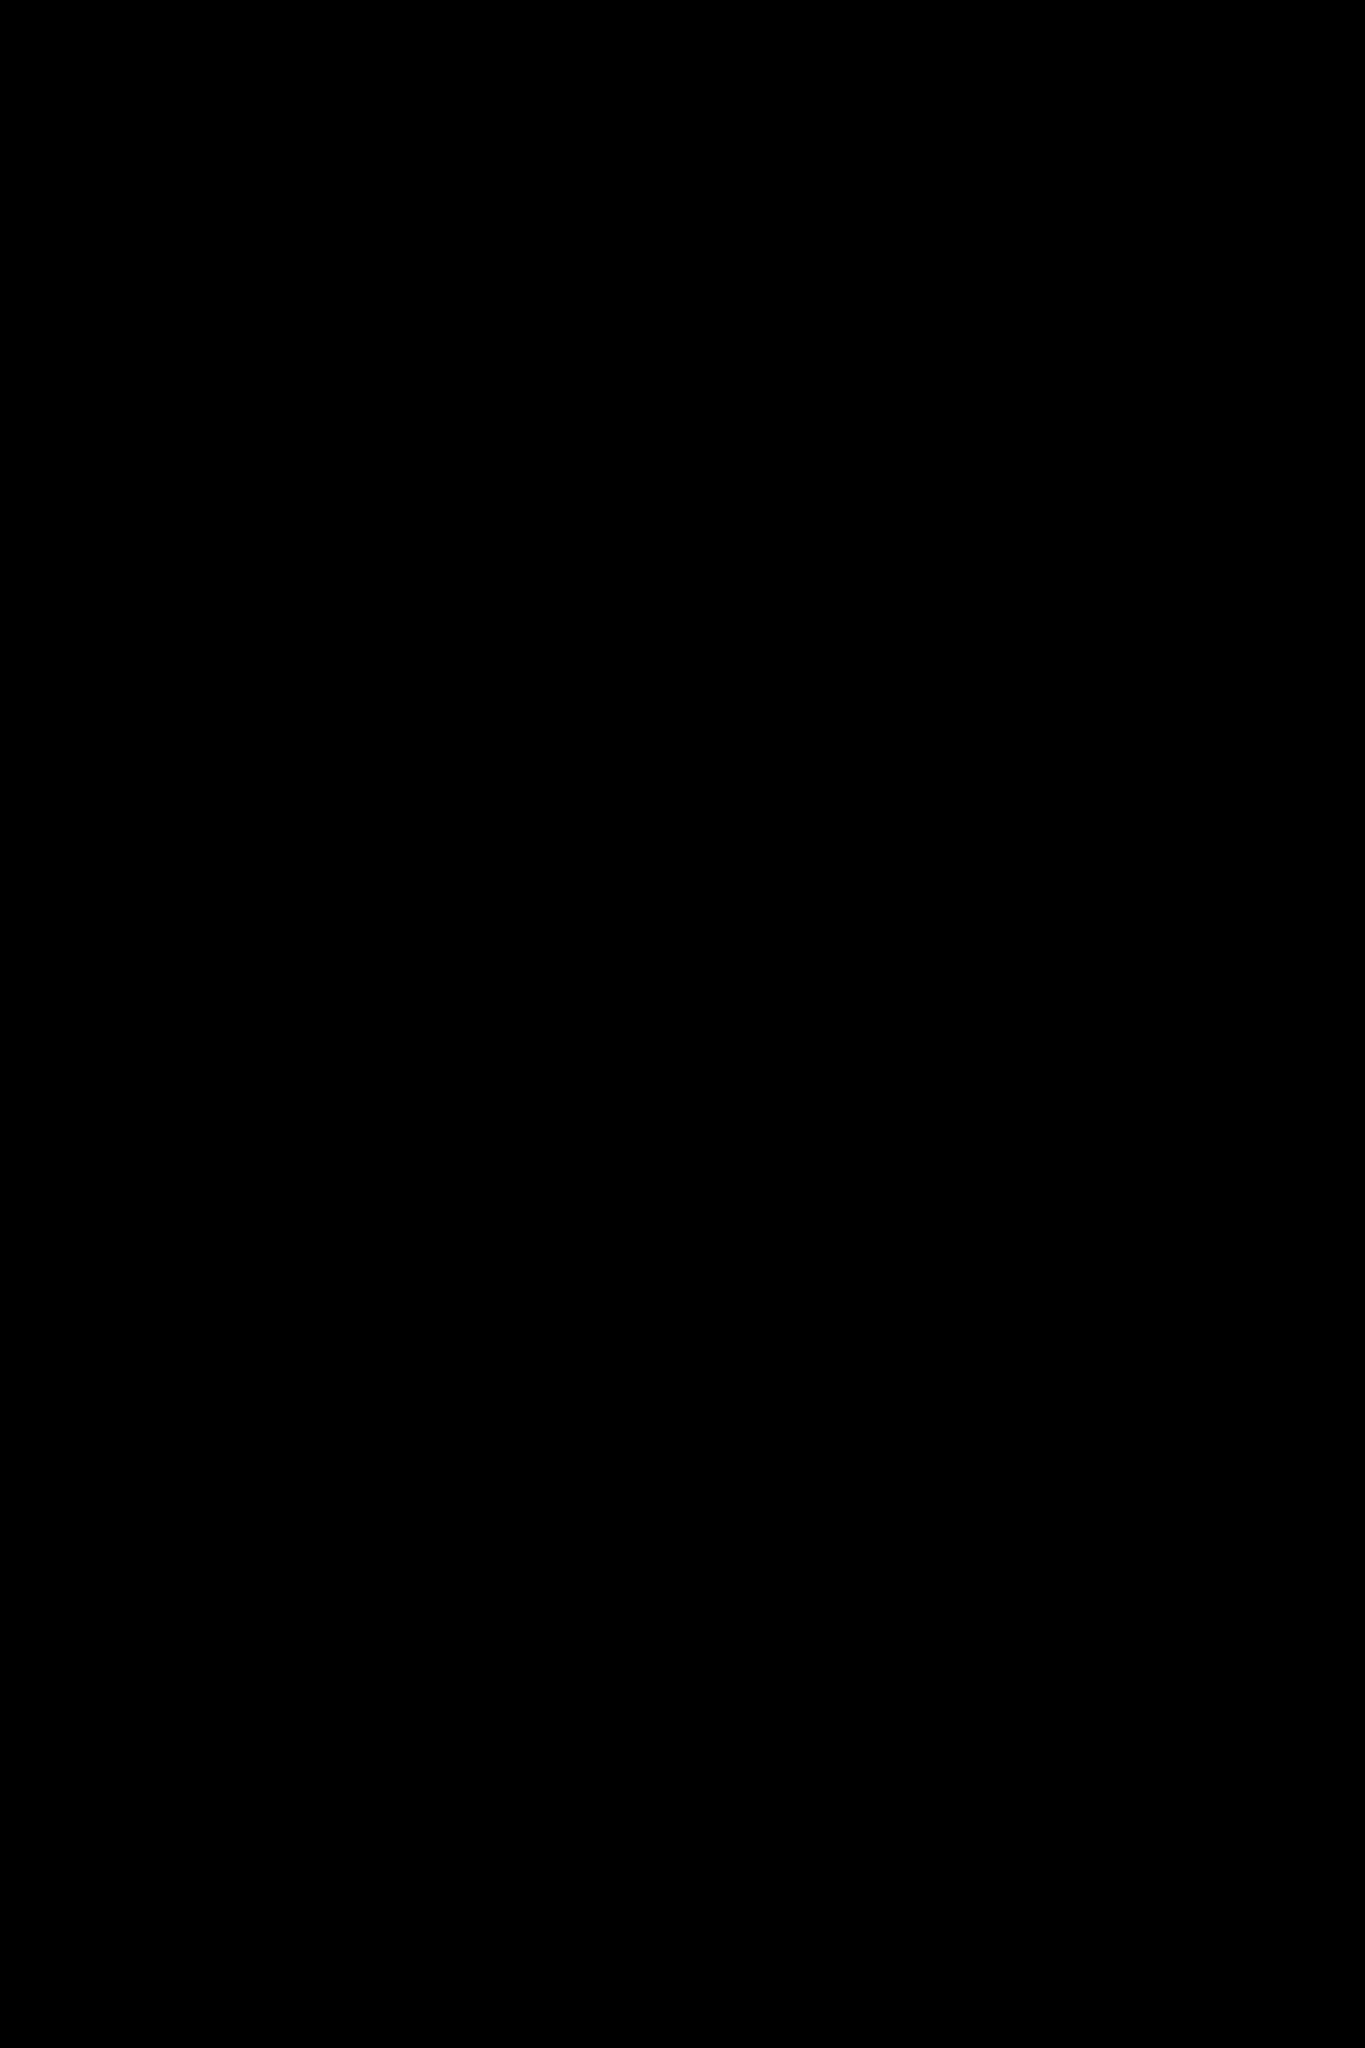 A-389